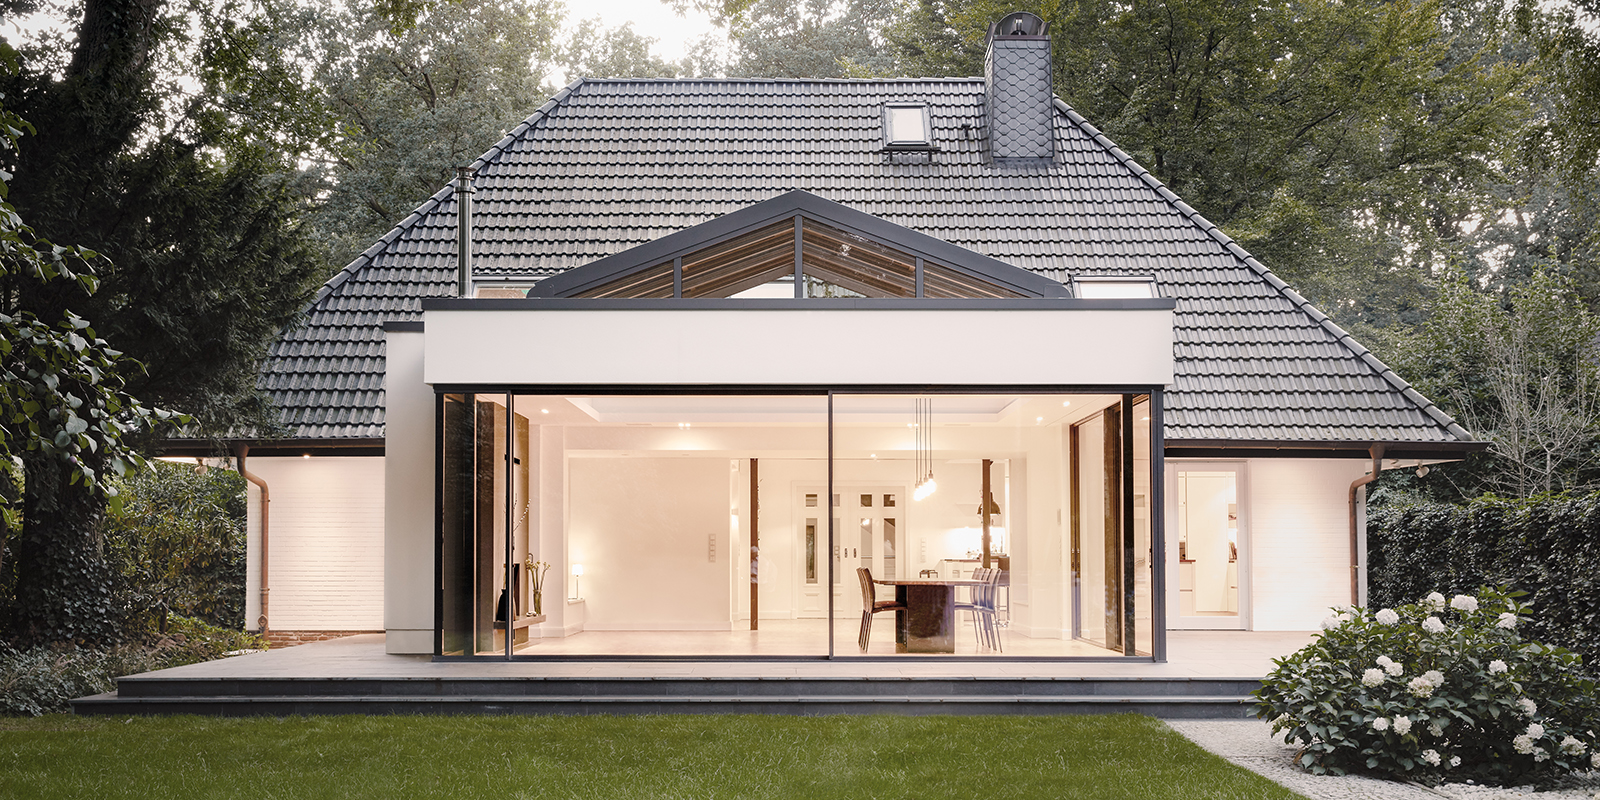 Solarlux, Cero, Schuifpui, Schuifsystheem, grote ramen, luxe raamoppervlaktes.